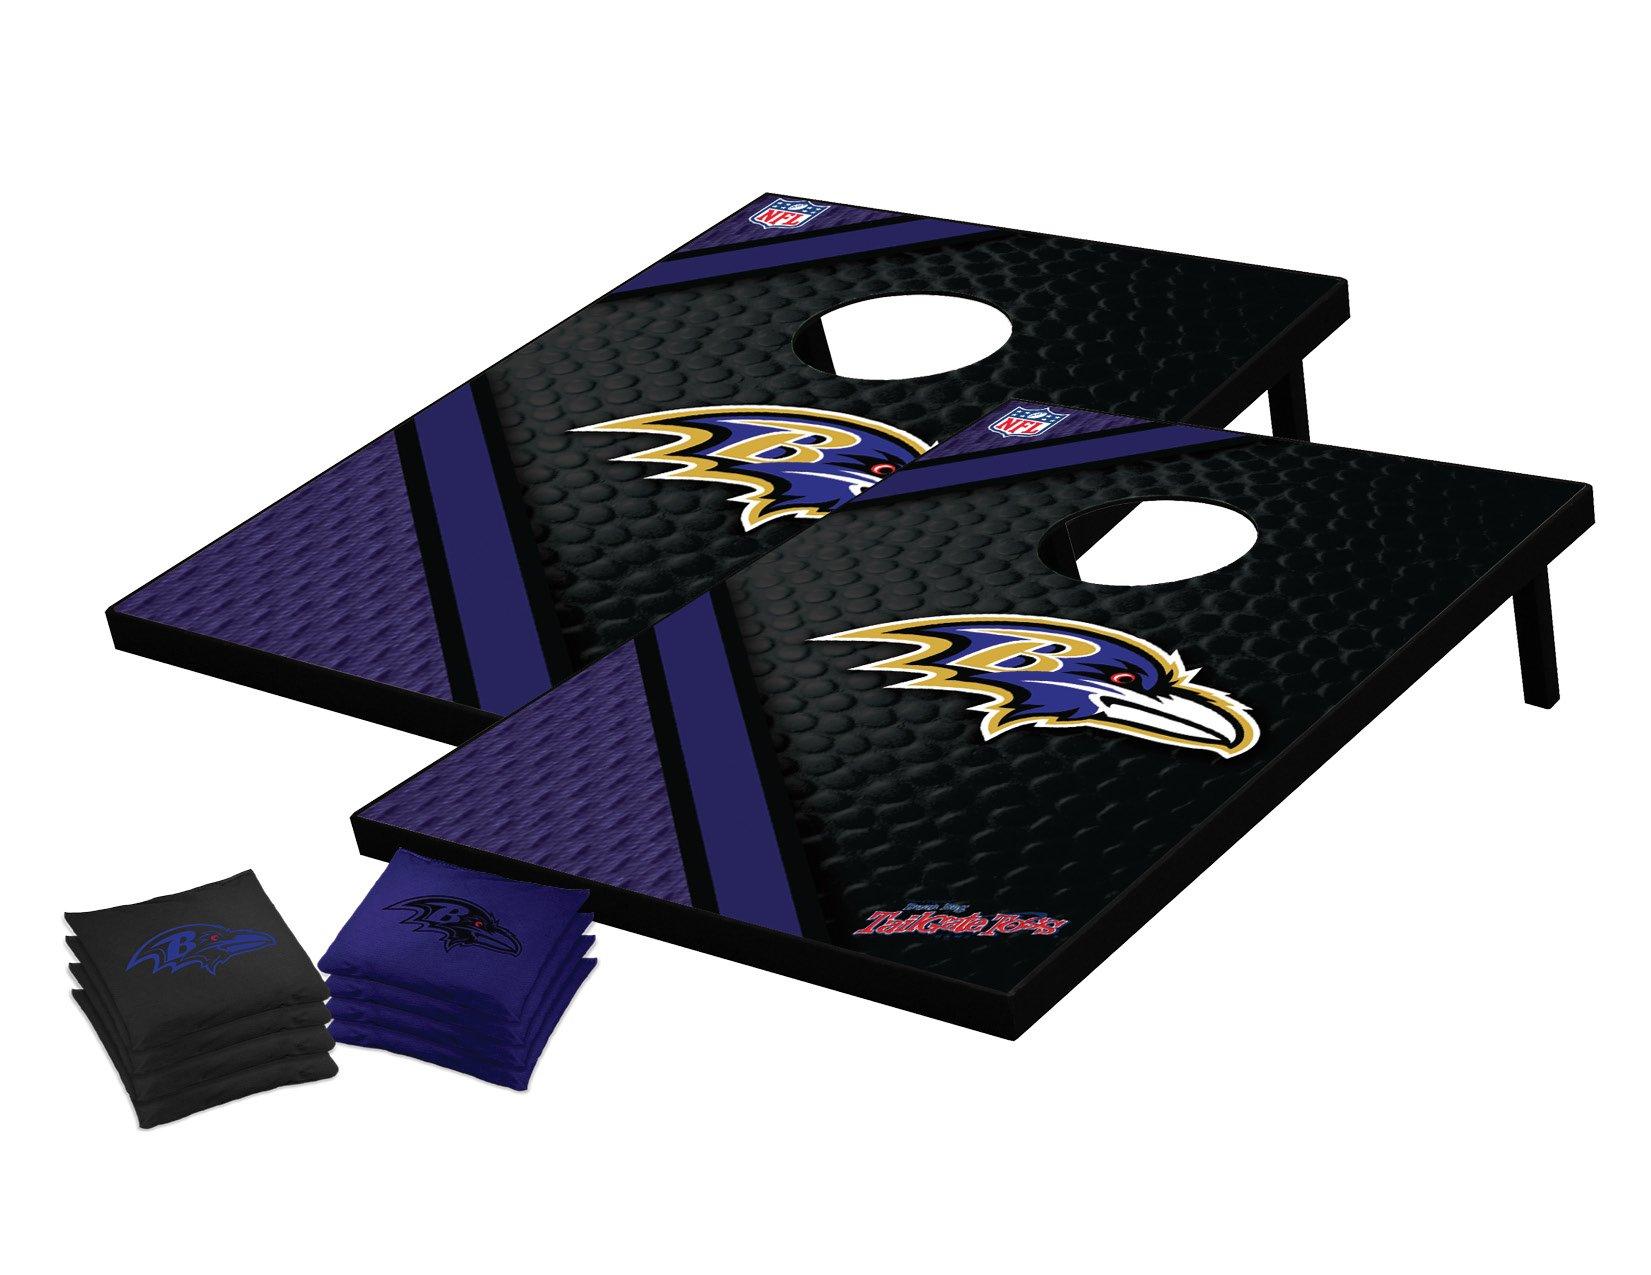 Wild Sports NFL Baltimore Ravens Tailgate Toss Bean Bag Game Set, Medium